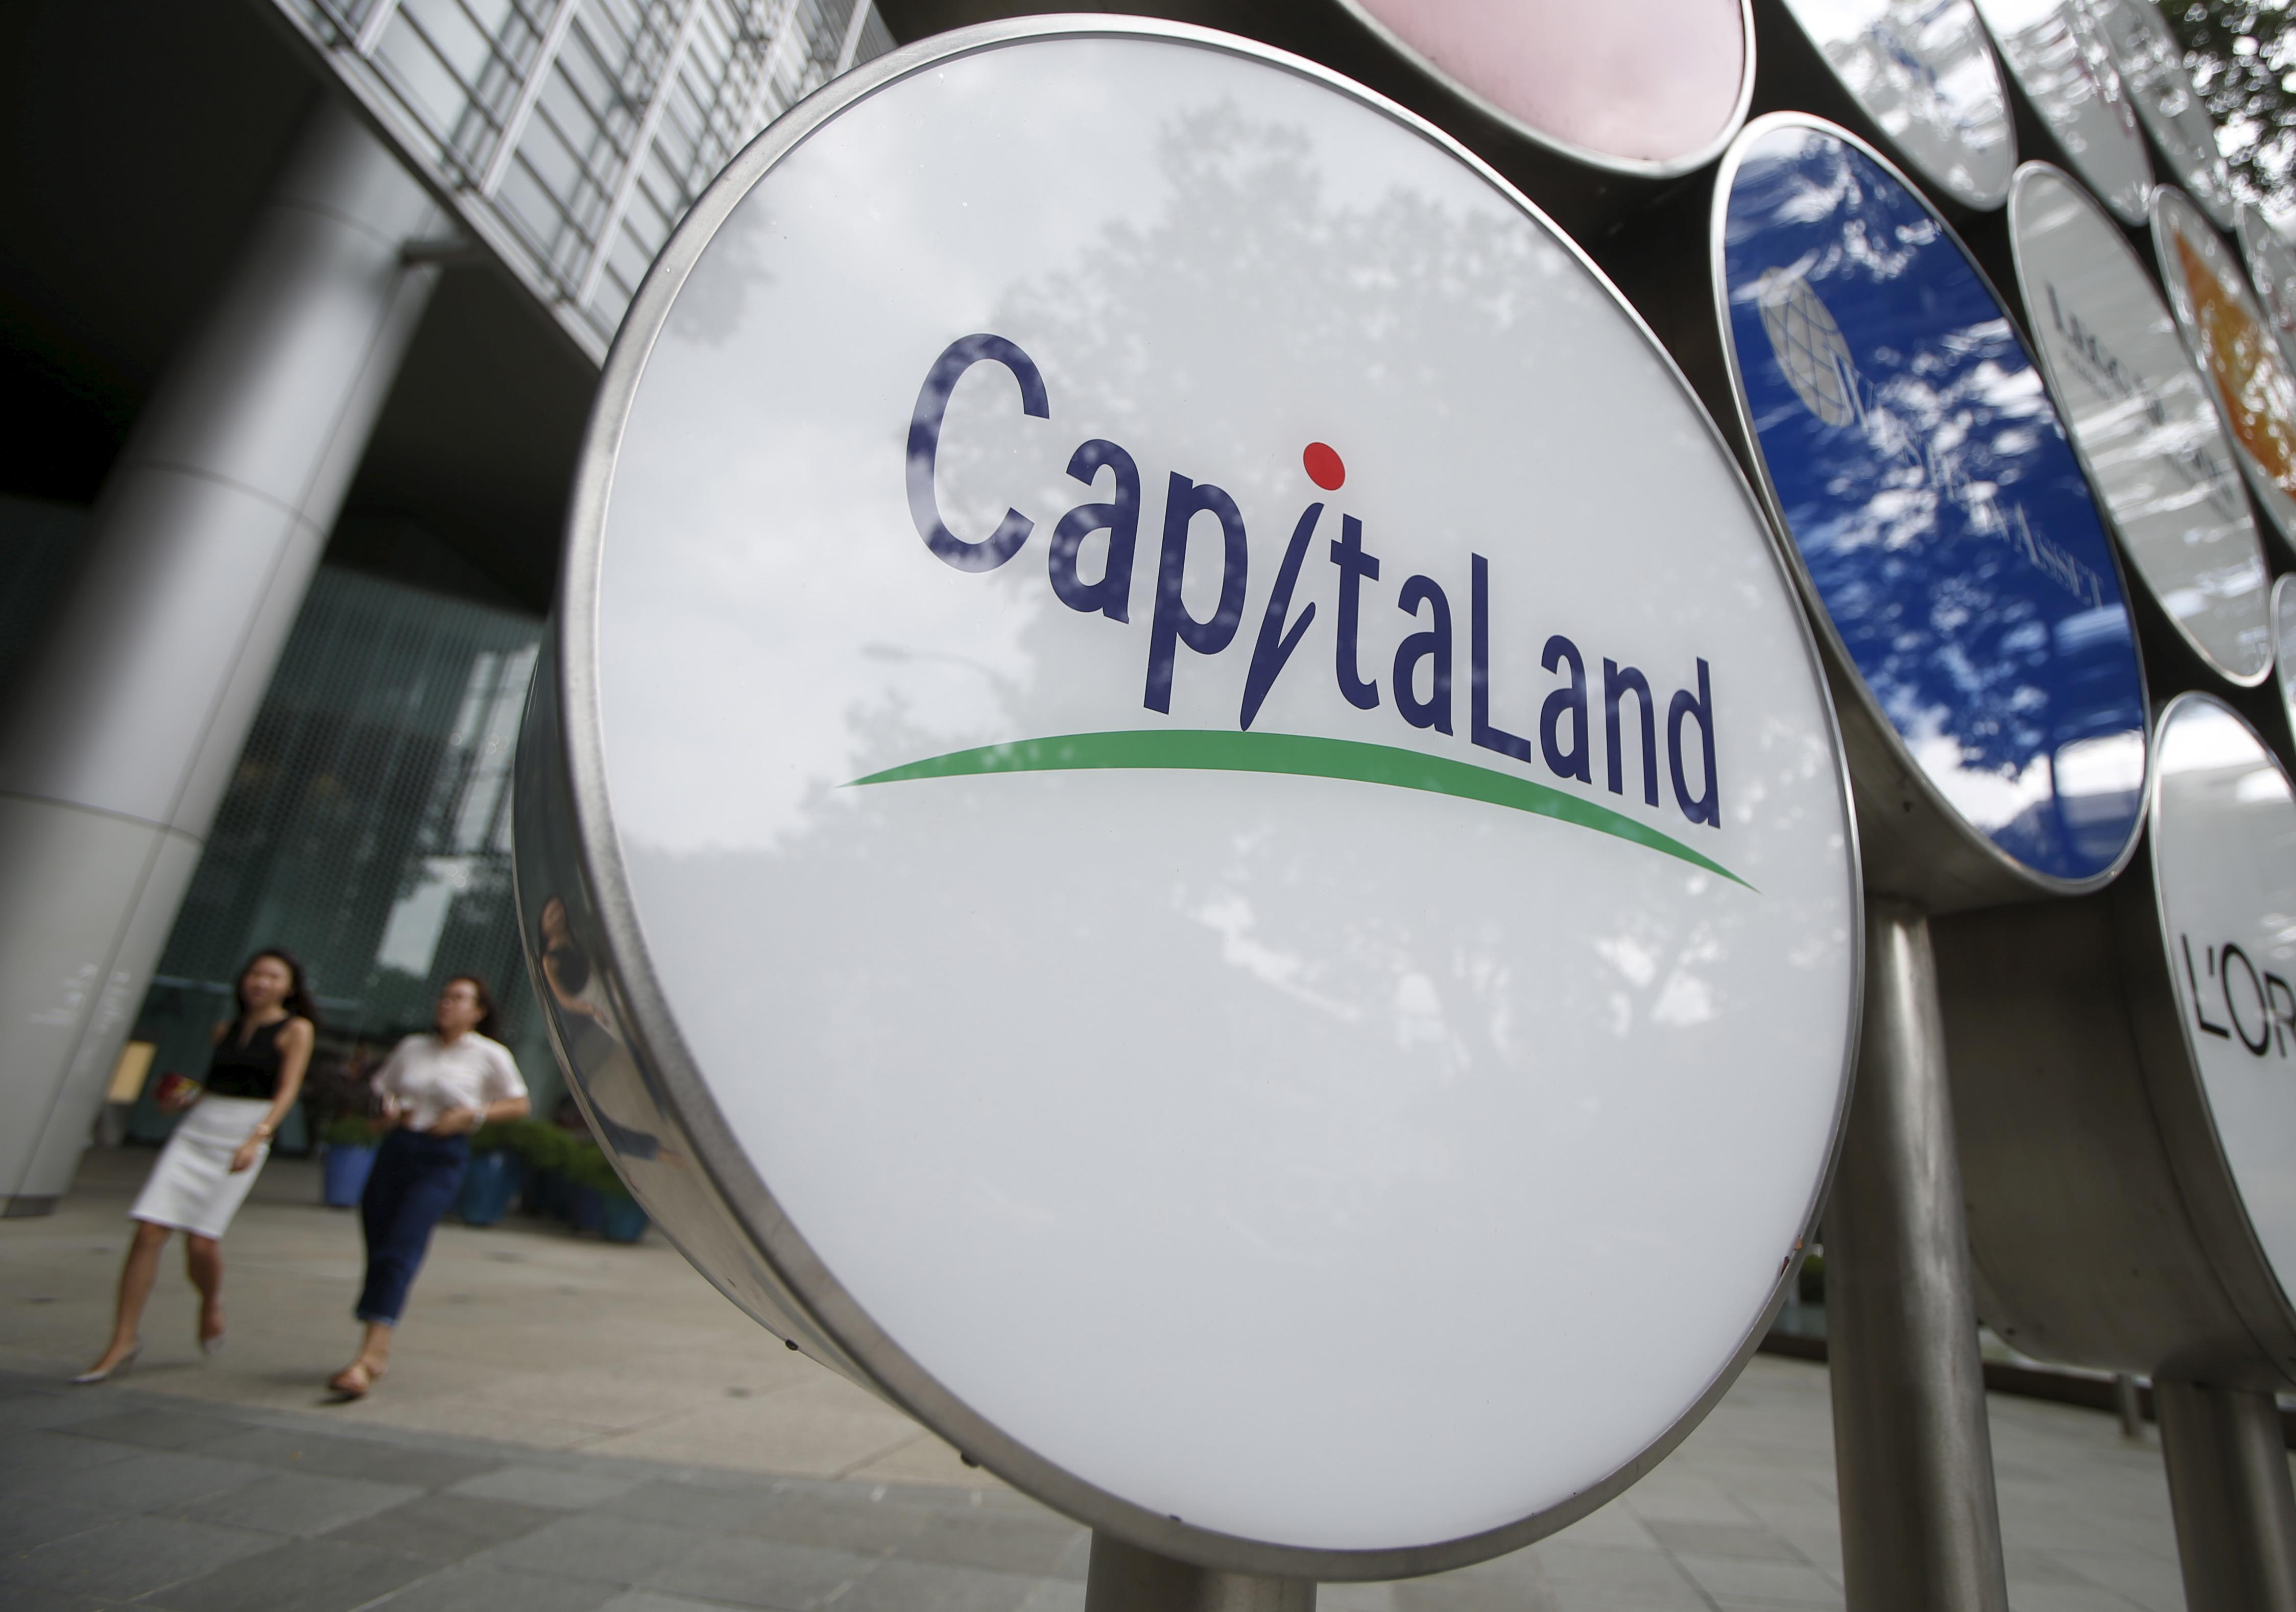 CapitaLand REIT said to pursue US$1.1 billion Duo office tower